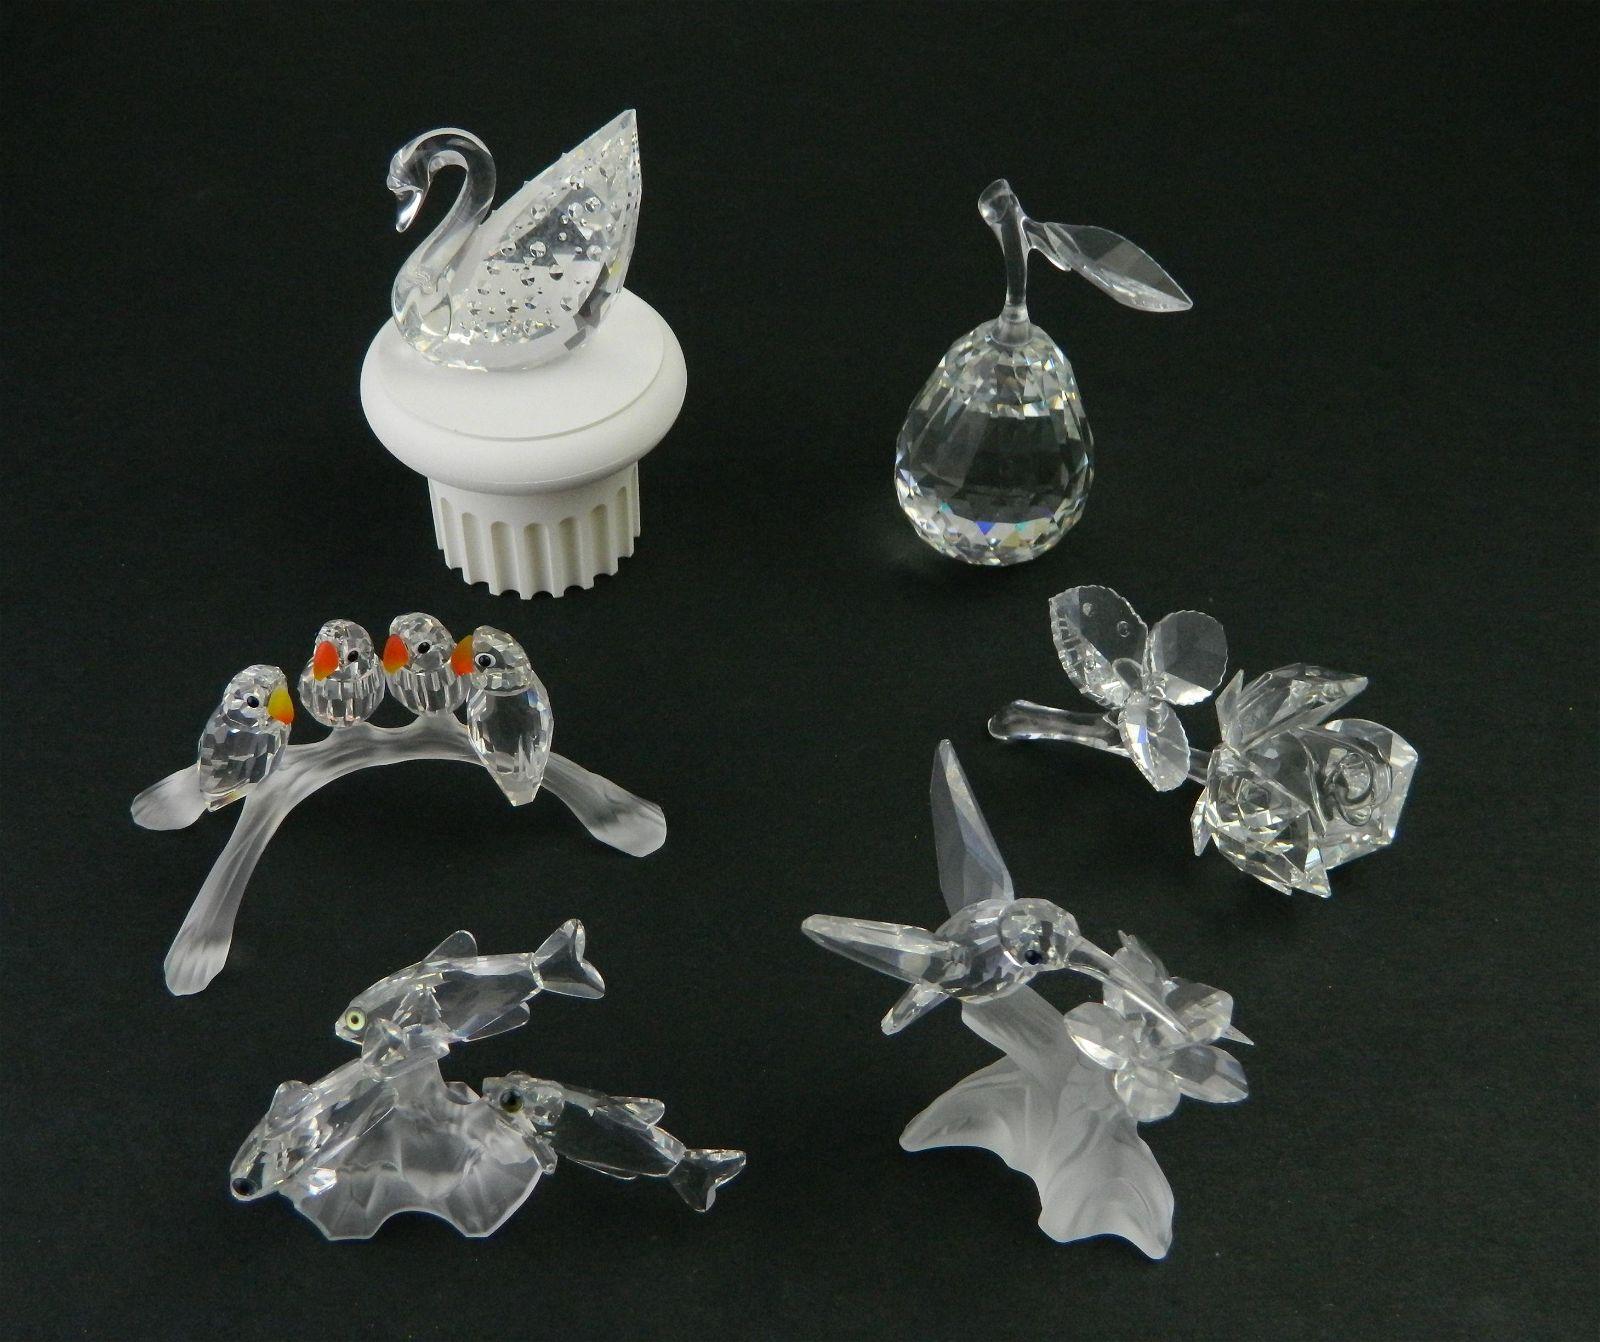 6 Swarovski crystal figurines